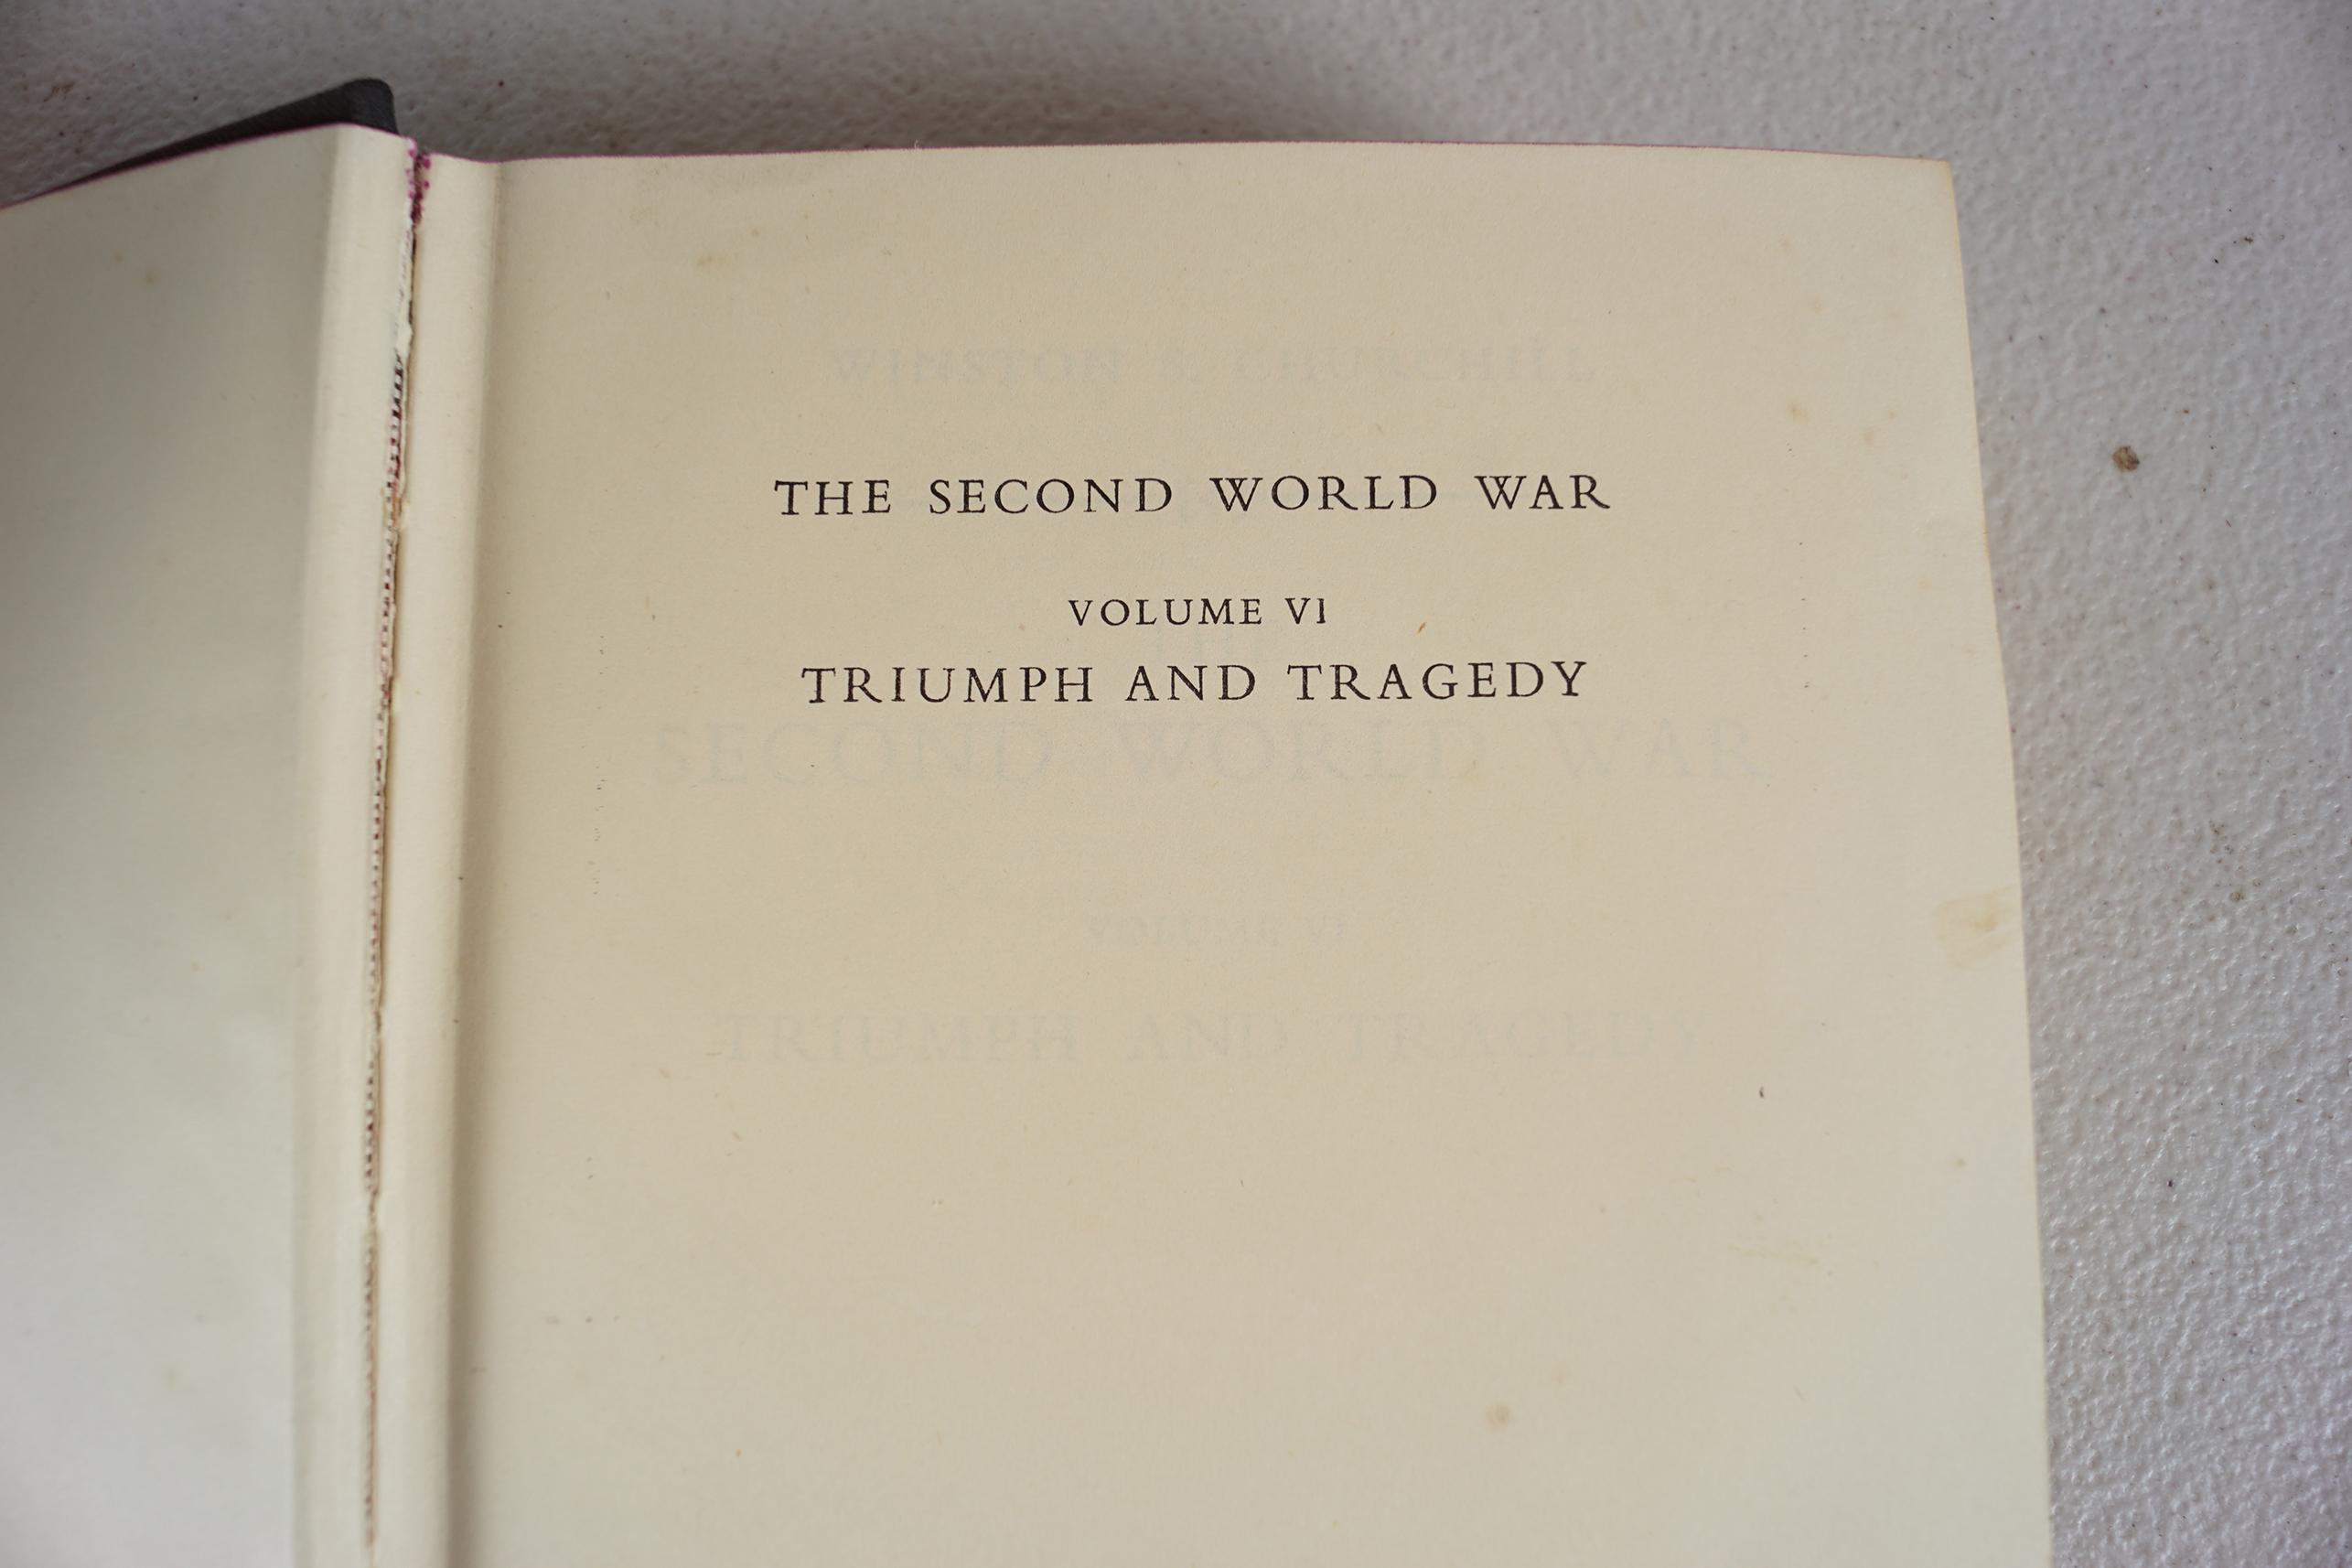 WINSTON CHURCHILL THE SECOND WORLD WAR 6 VOLUMES - Image 3 of 6